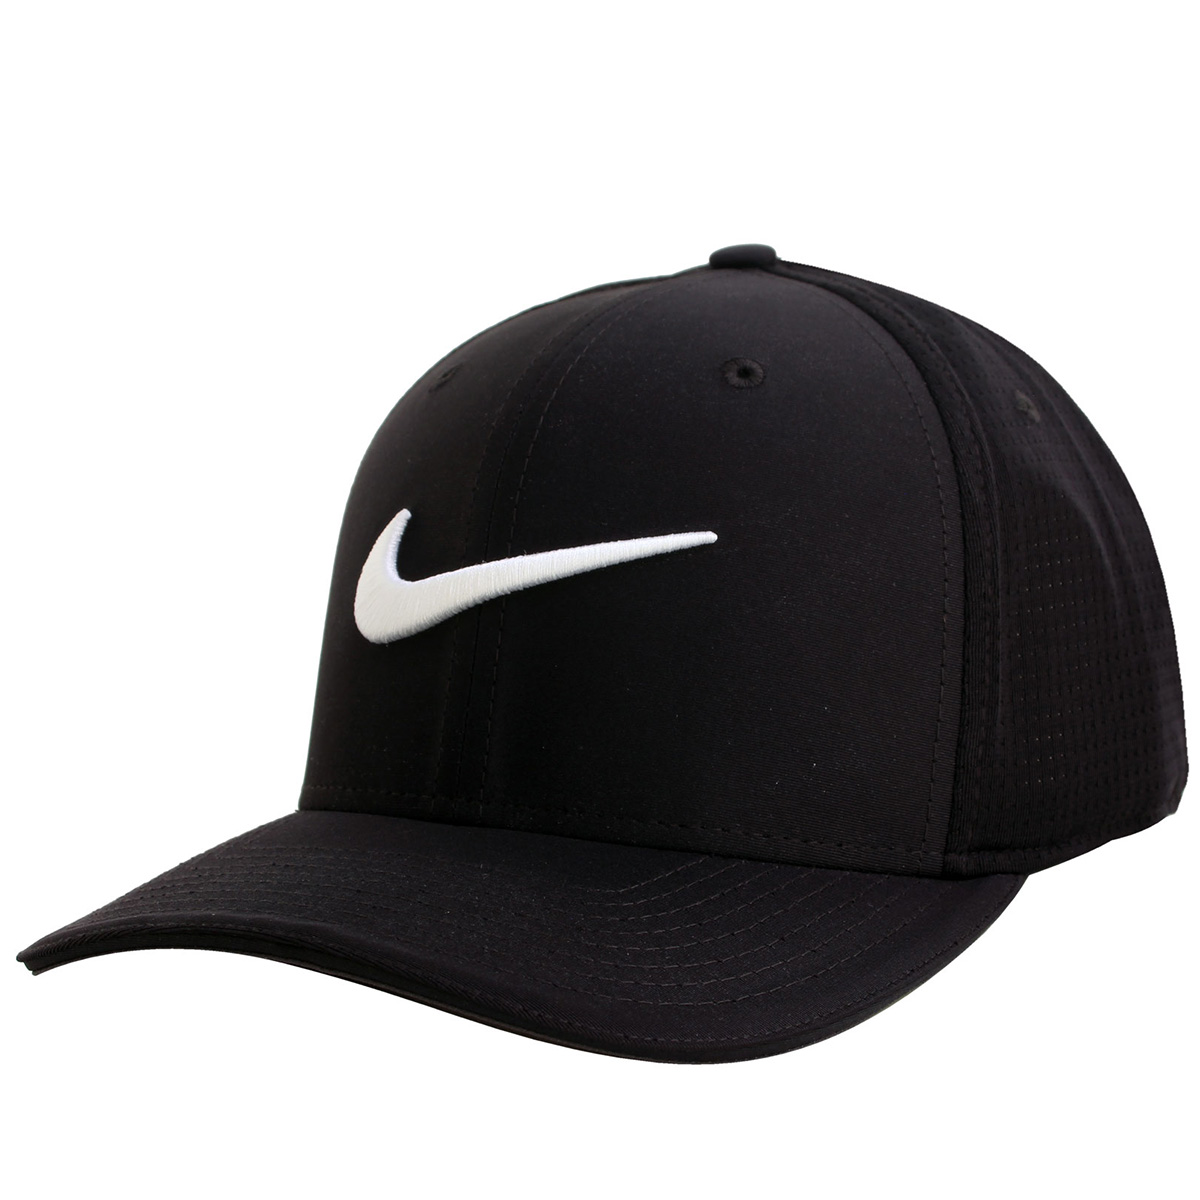 db0a0f5d1018f Nike Golf Classic 99 Mesh Cap from american golf